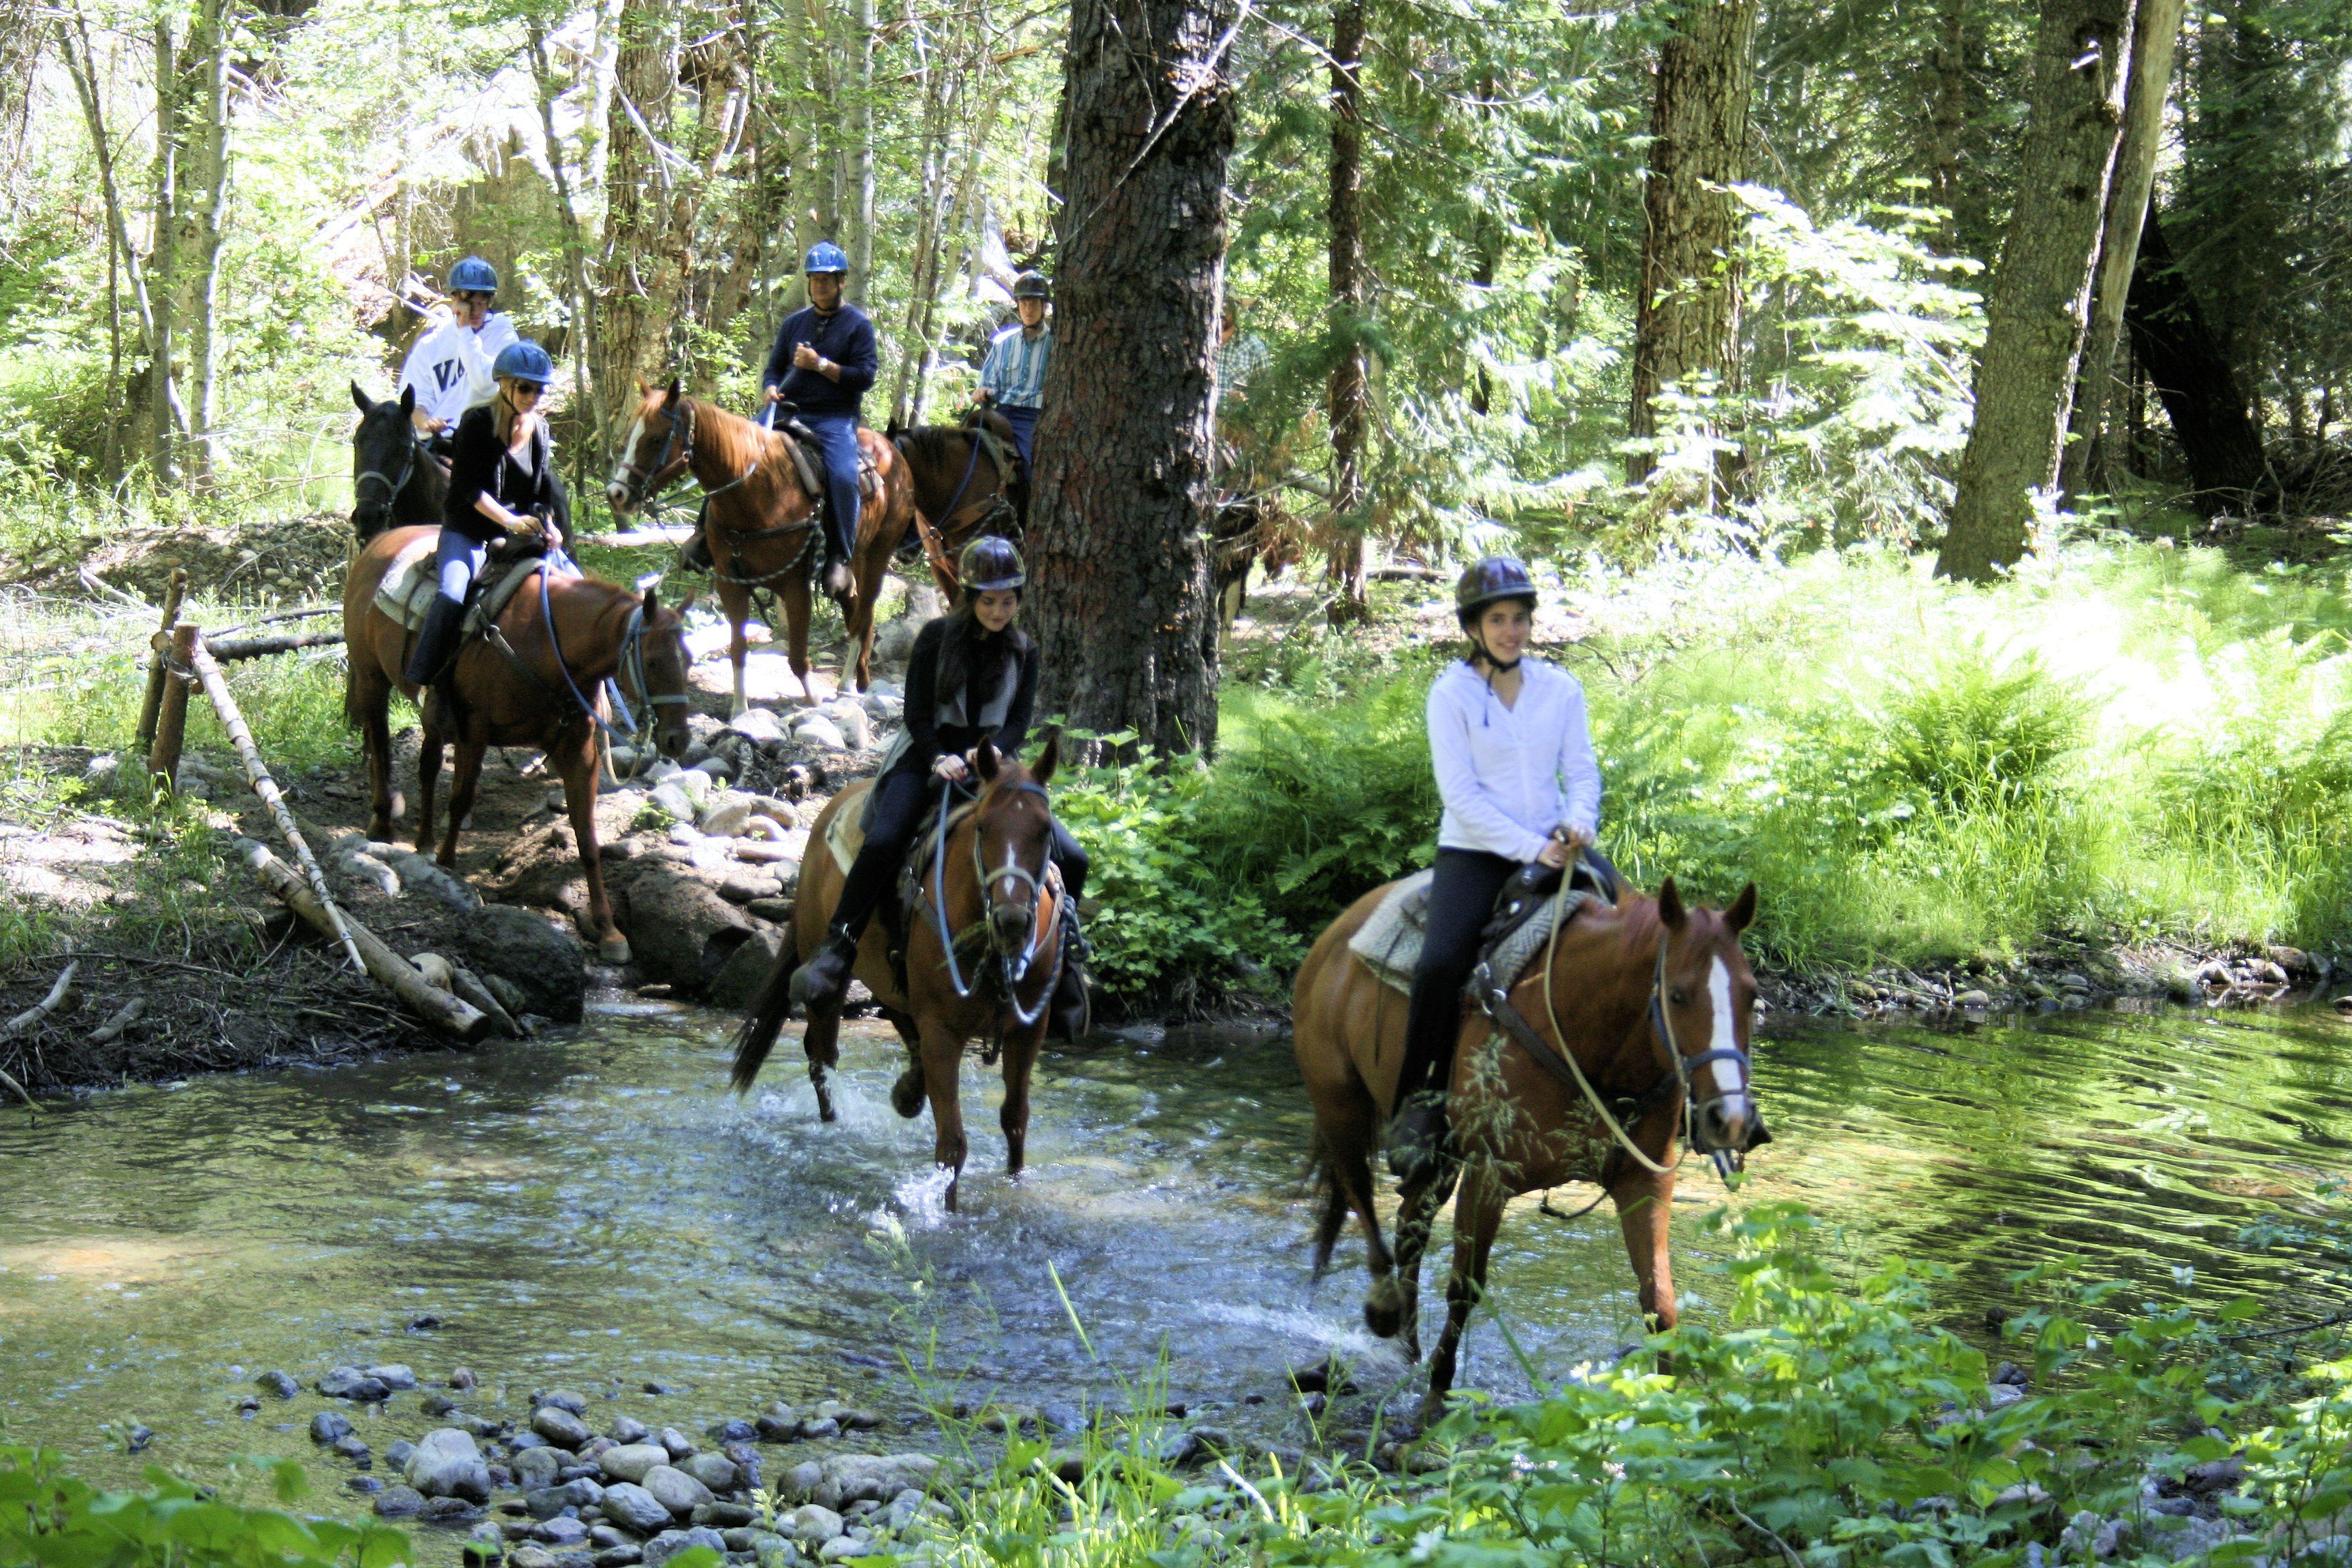 Yosemite Trails Pack Station riders